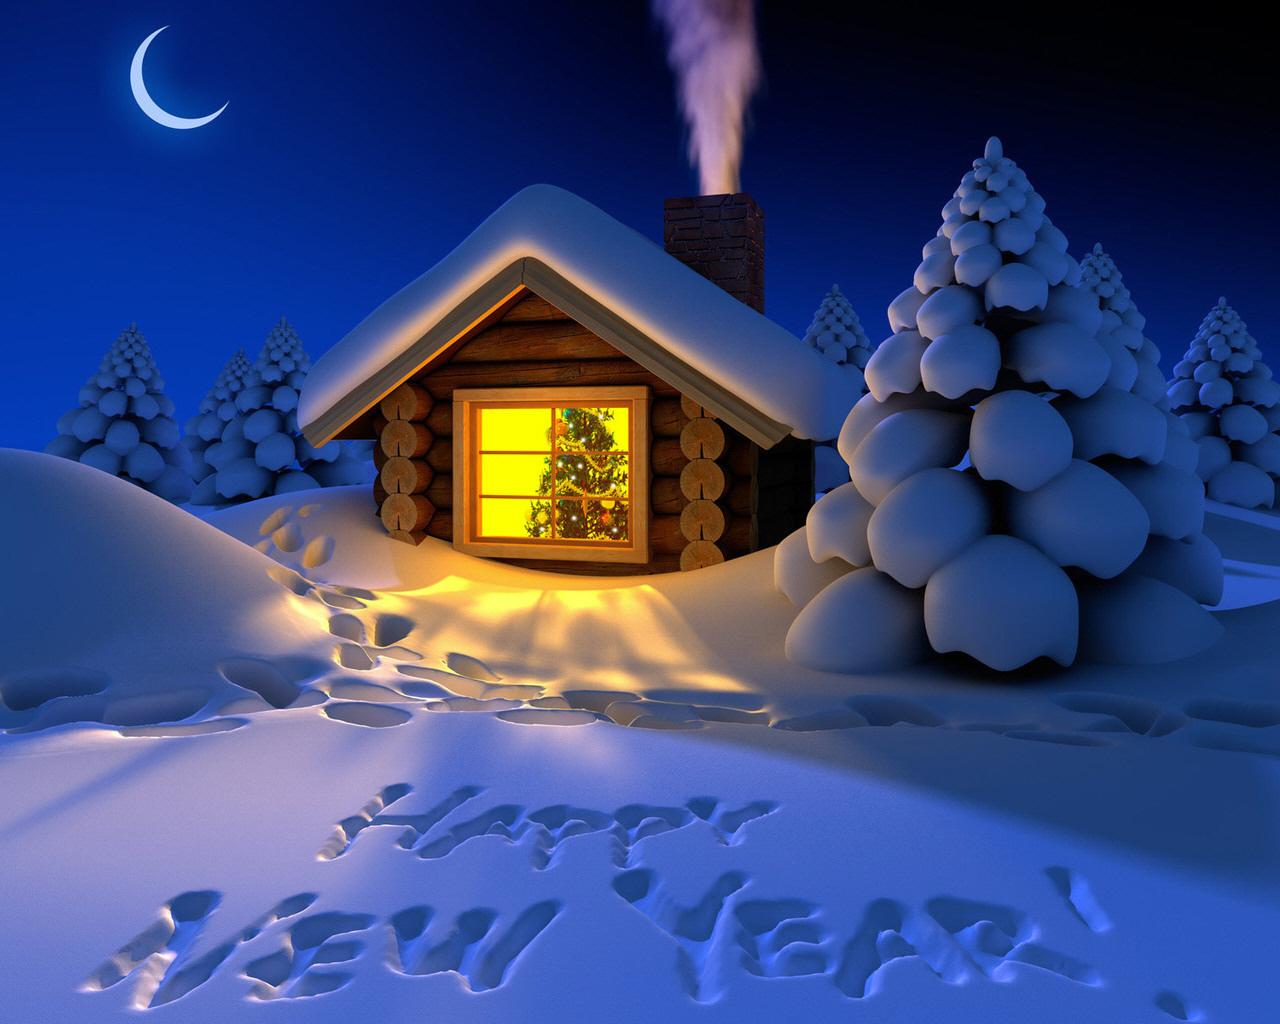 Free download Best Desktop HD Wallpaper Happy New Year Photo